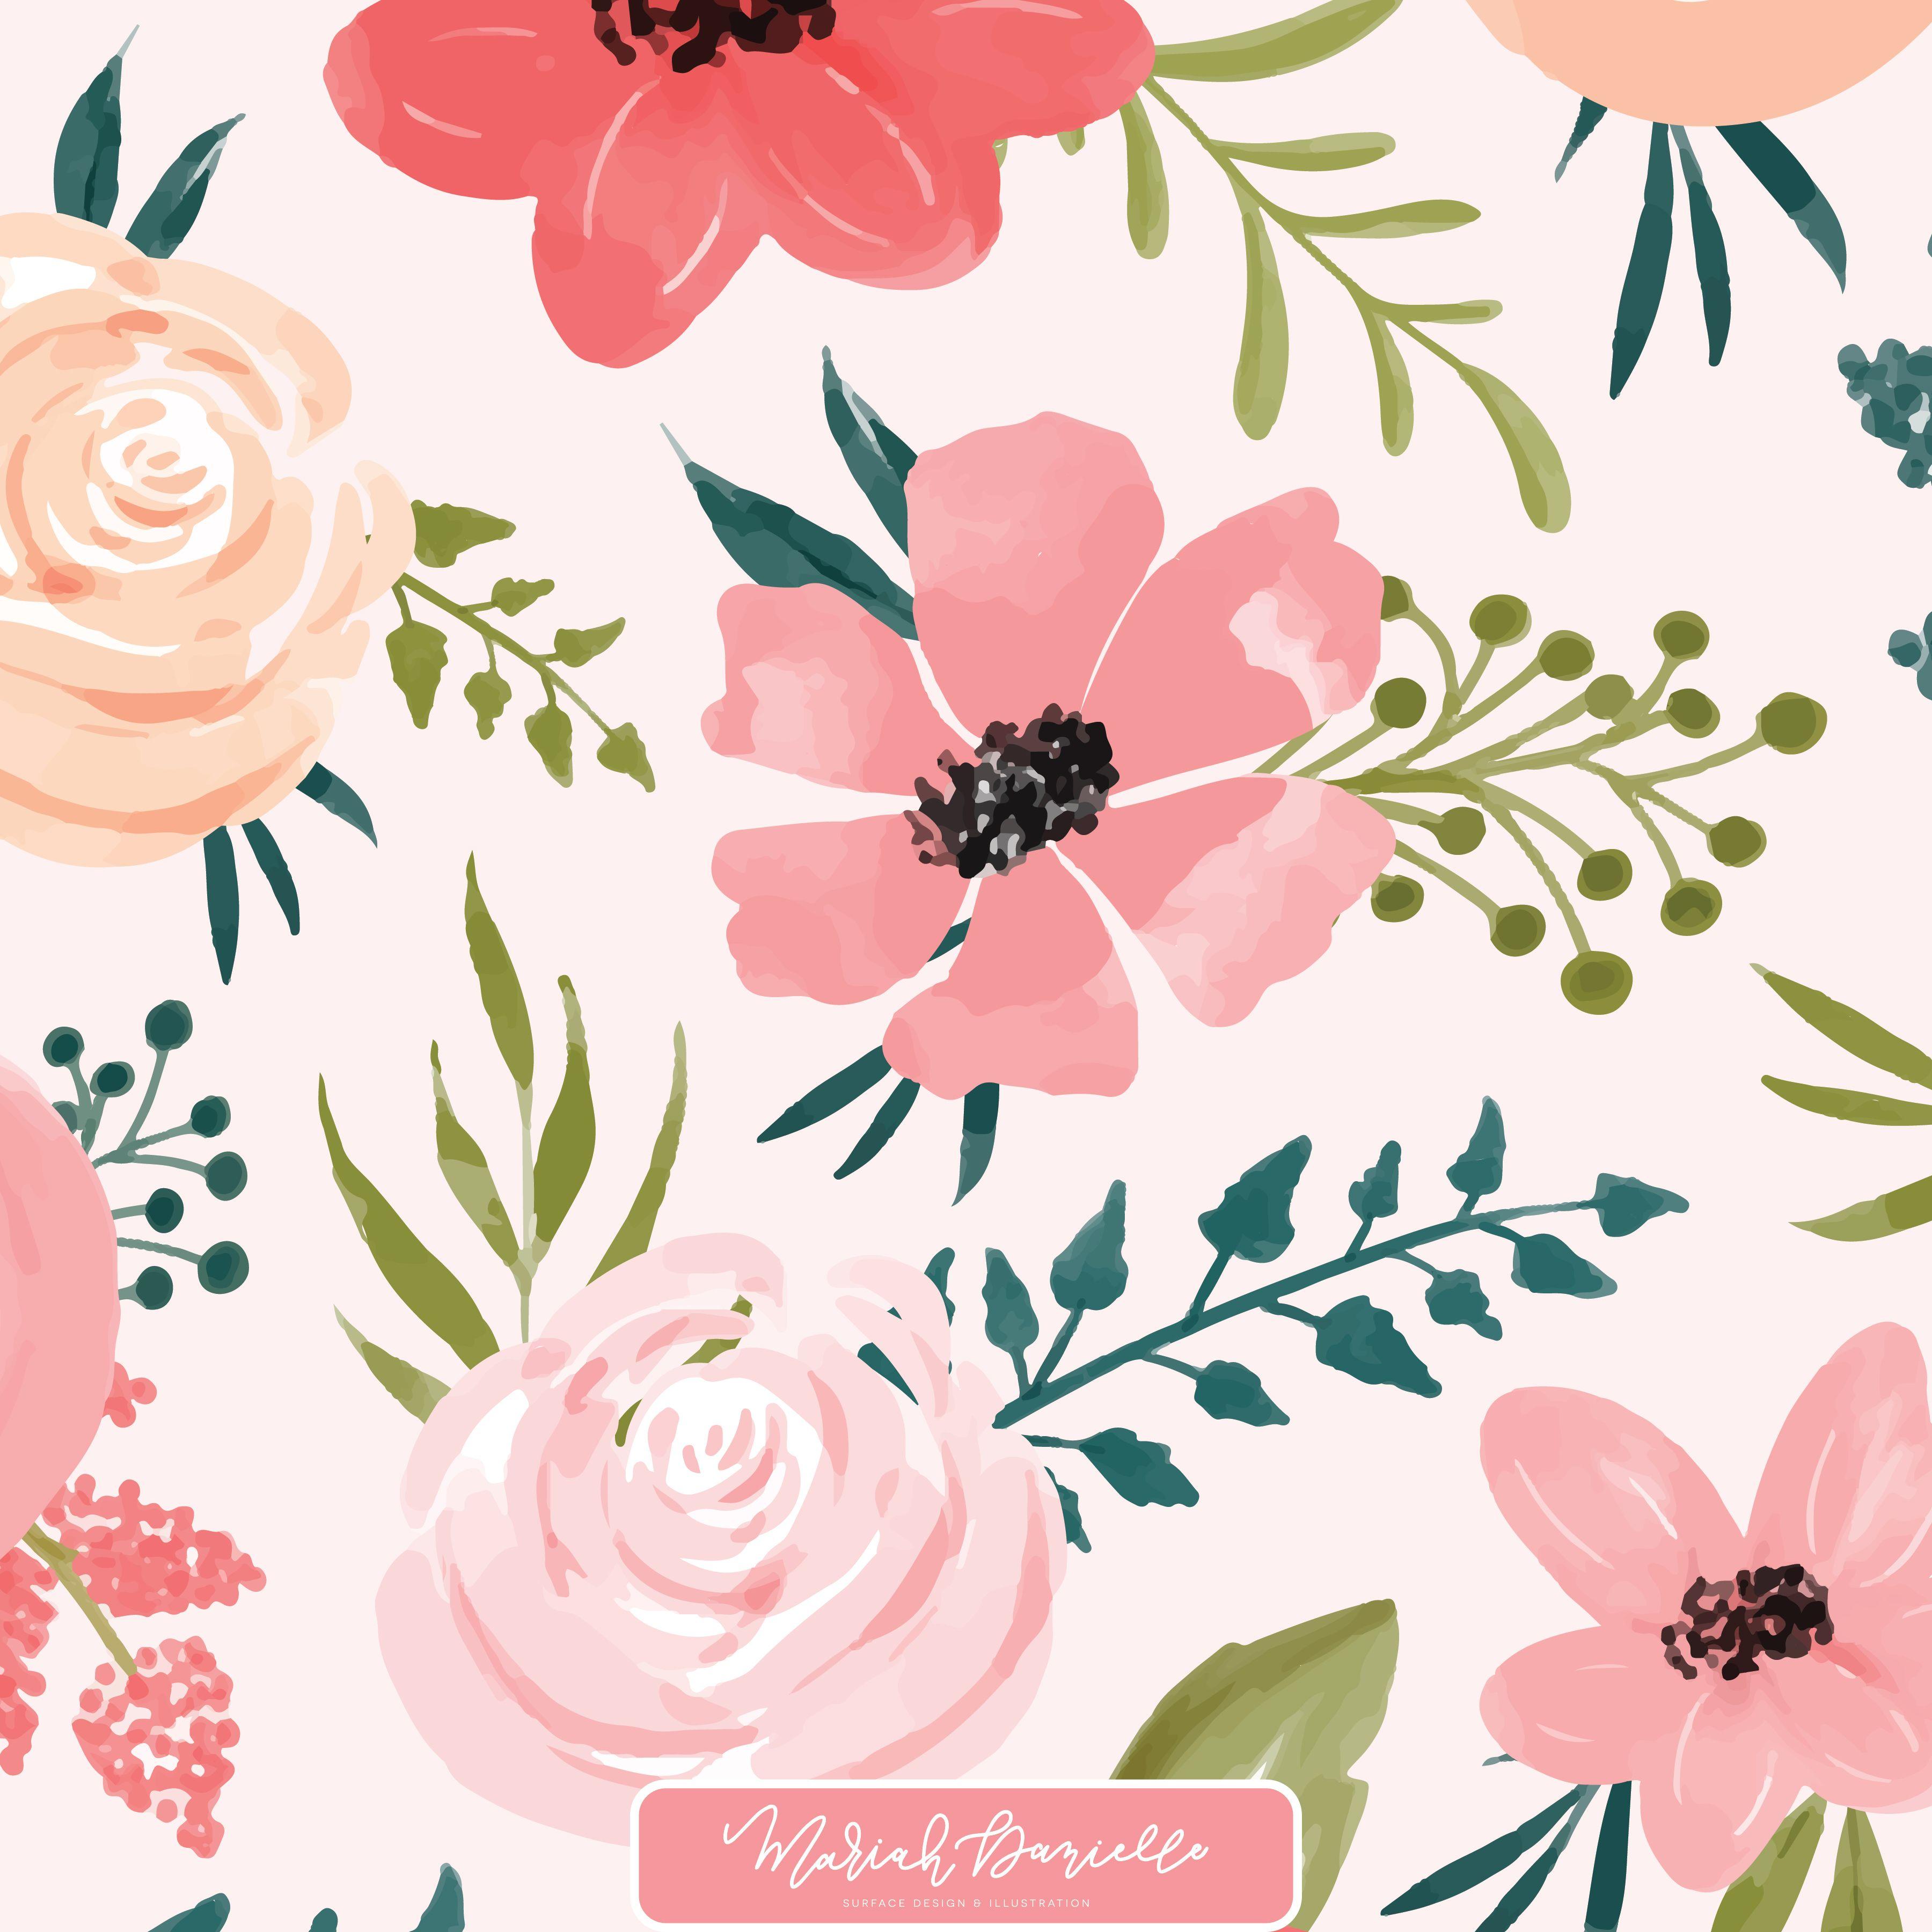 Watermelon & Poppy Floral Graphic Set.